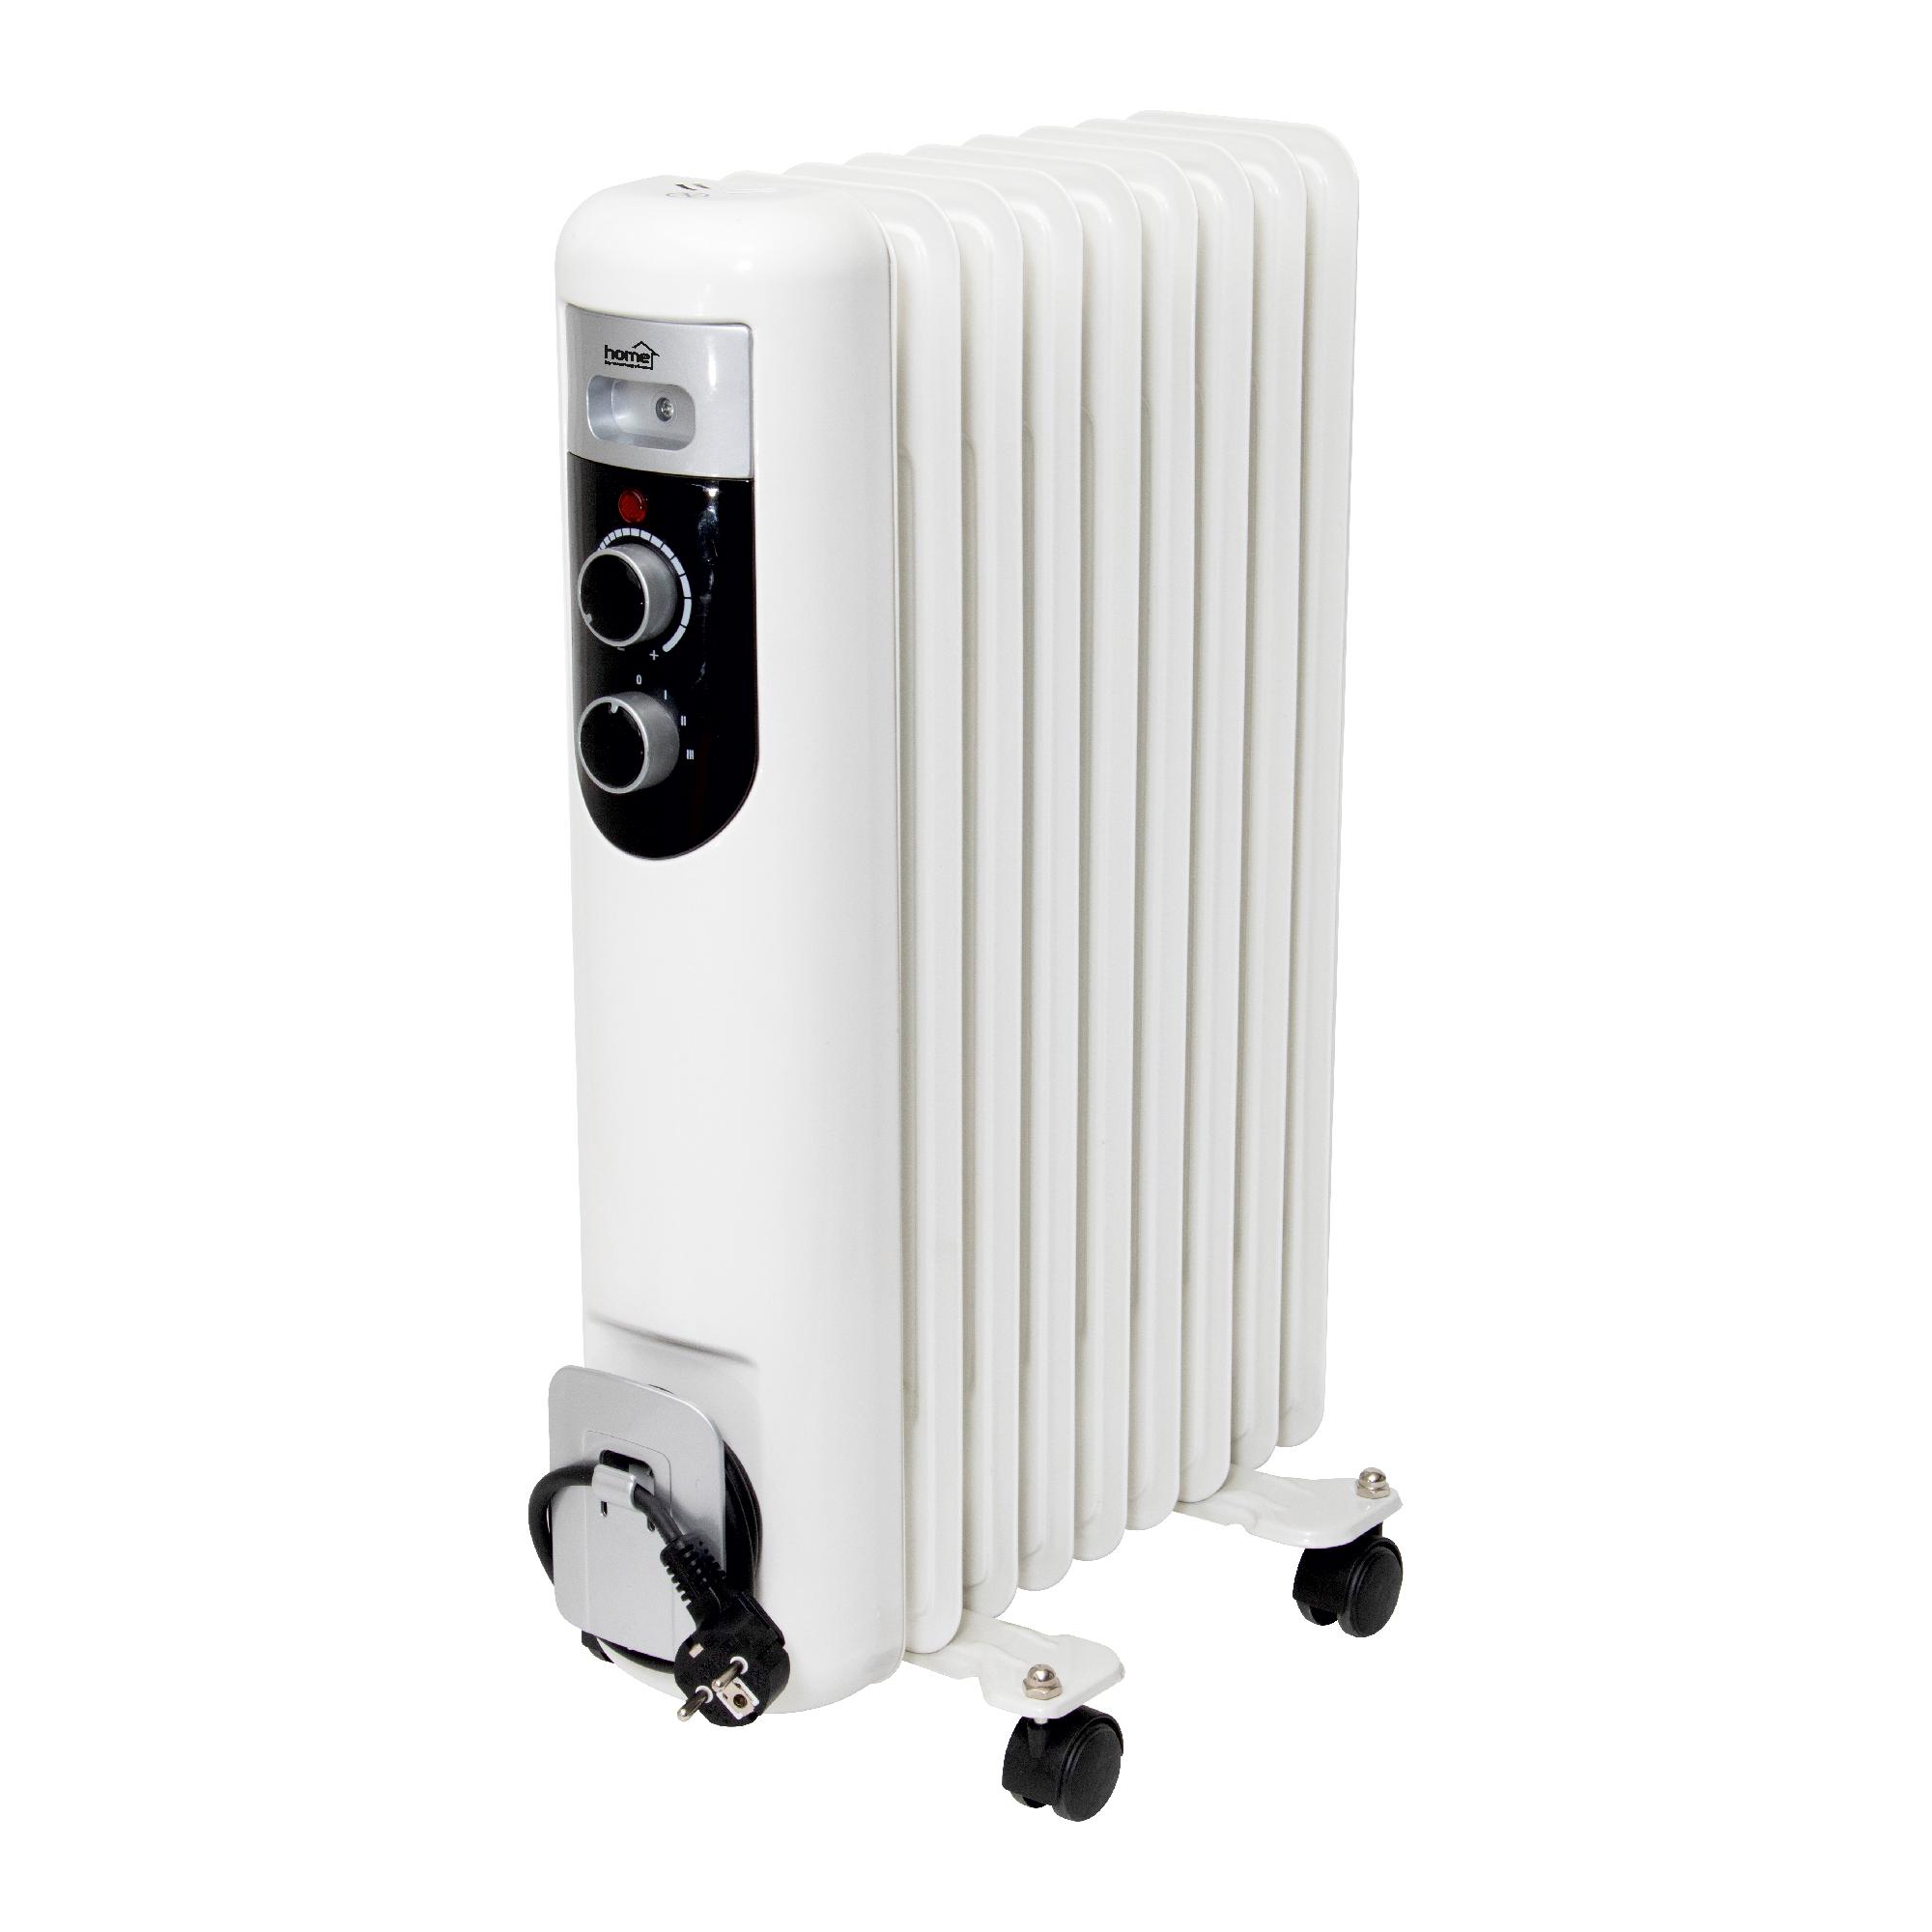 Calorifer electric cu ulei Home by somogyi FKOS 9M, 2 panouri convectoare, 2000W, aluminiu, alb, 60 x 44 cm imagine 2021 mathaus